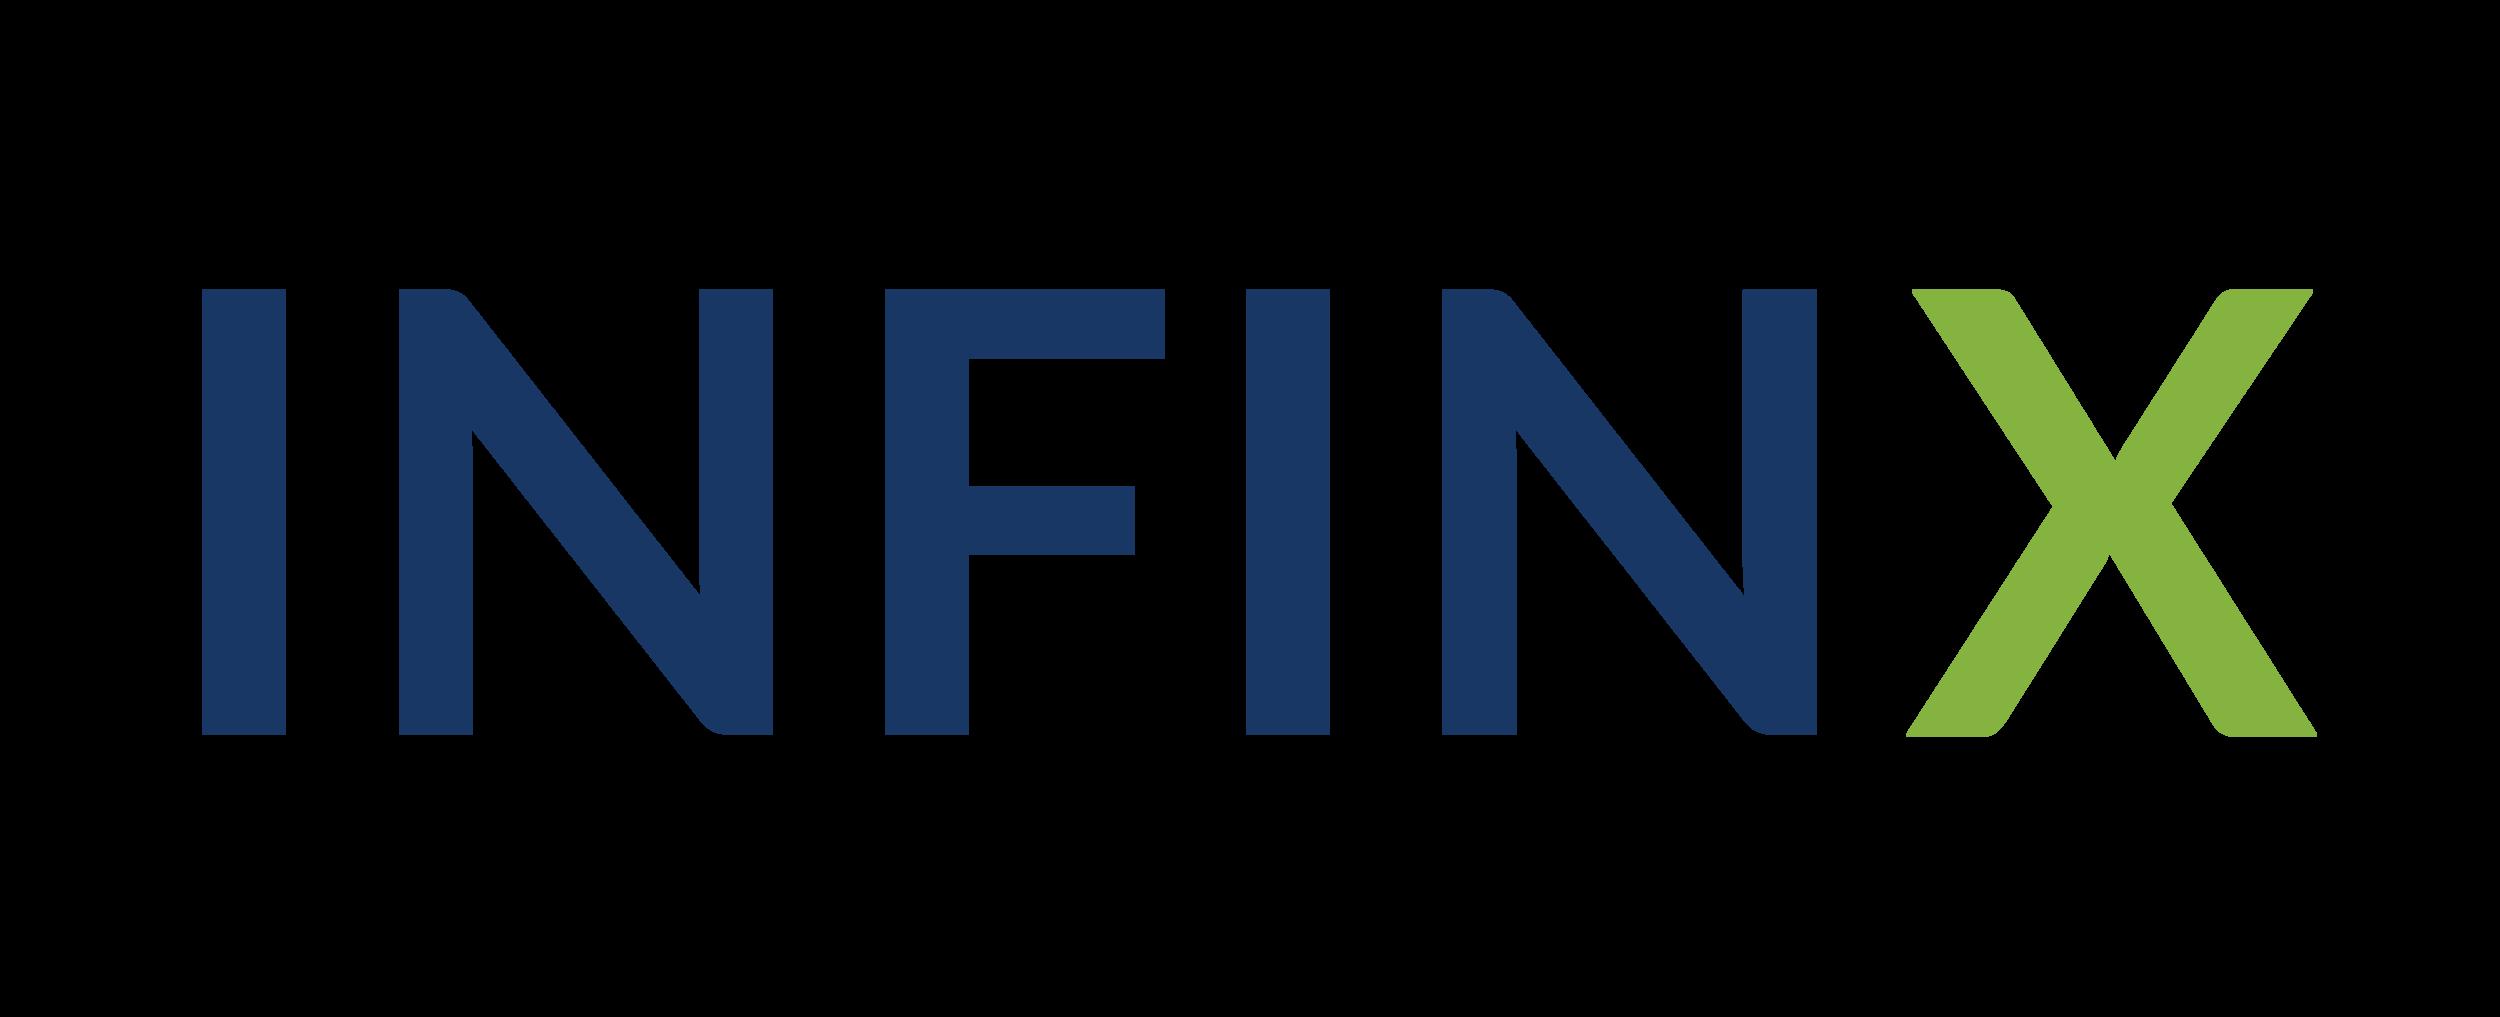 Infinx-logo-transparent-background copy.png